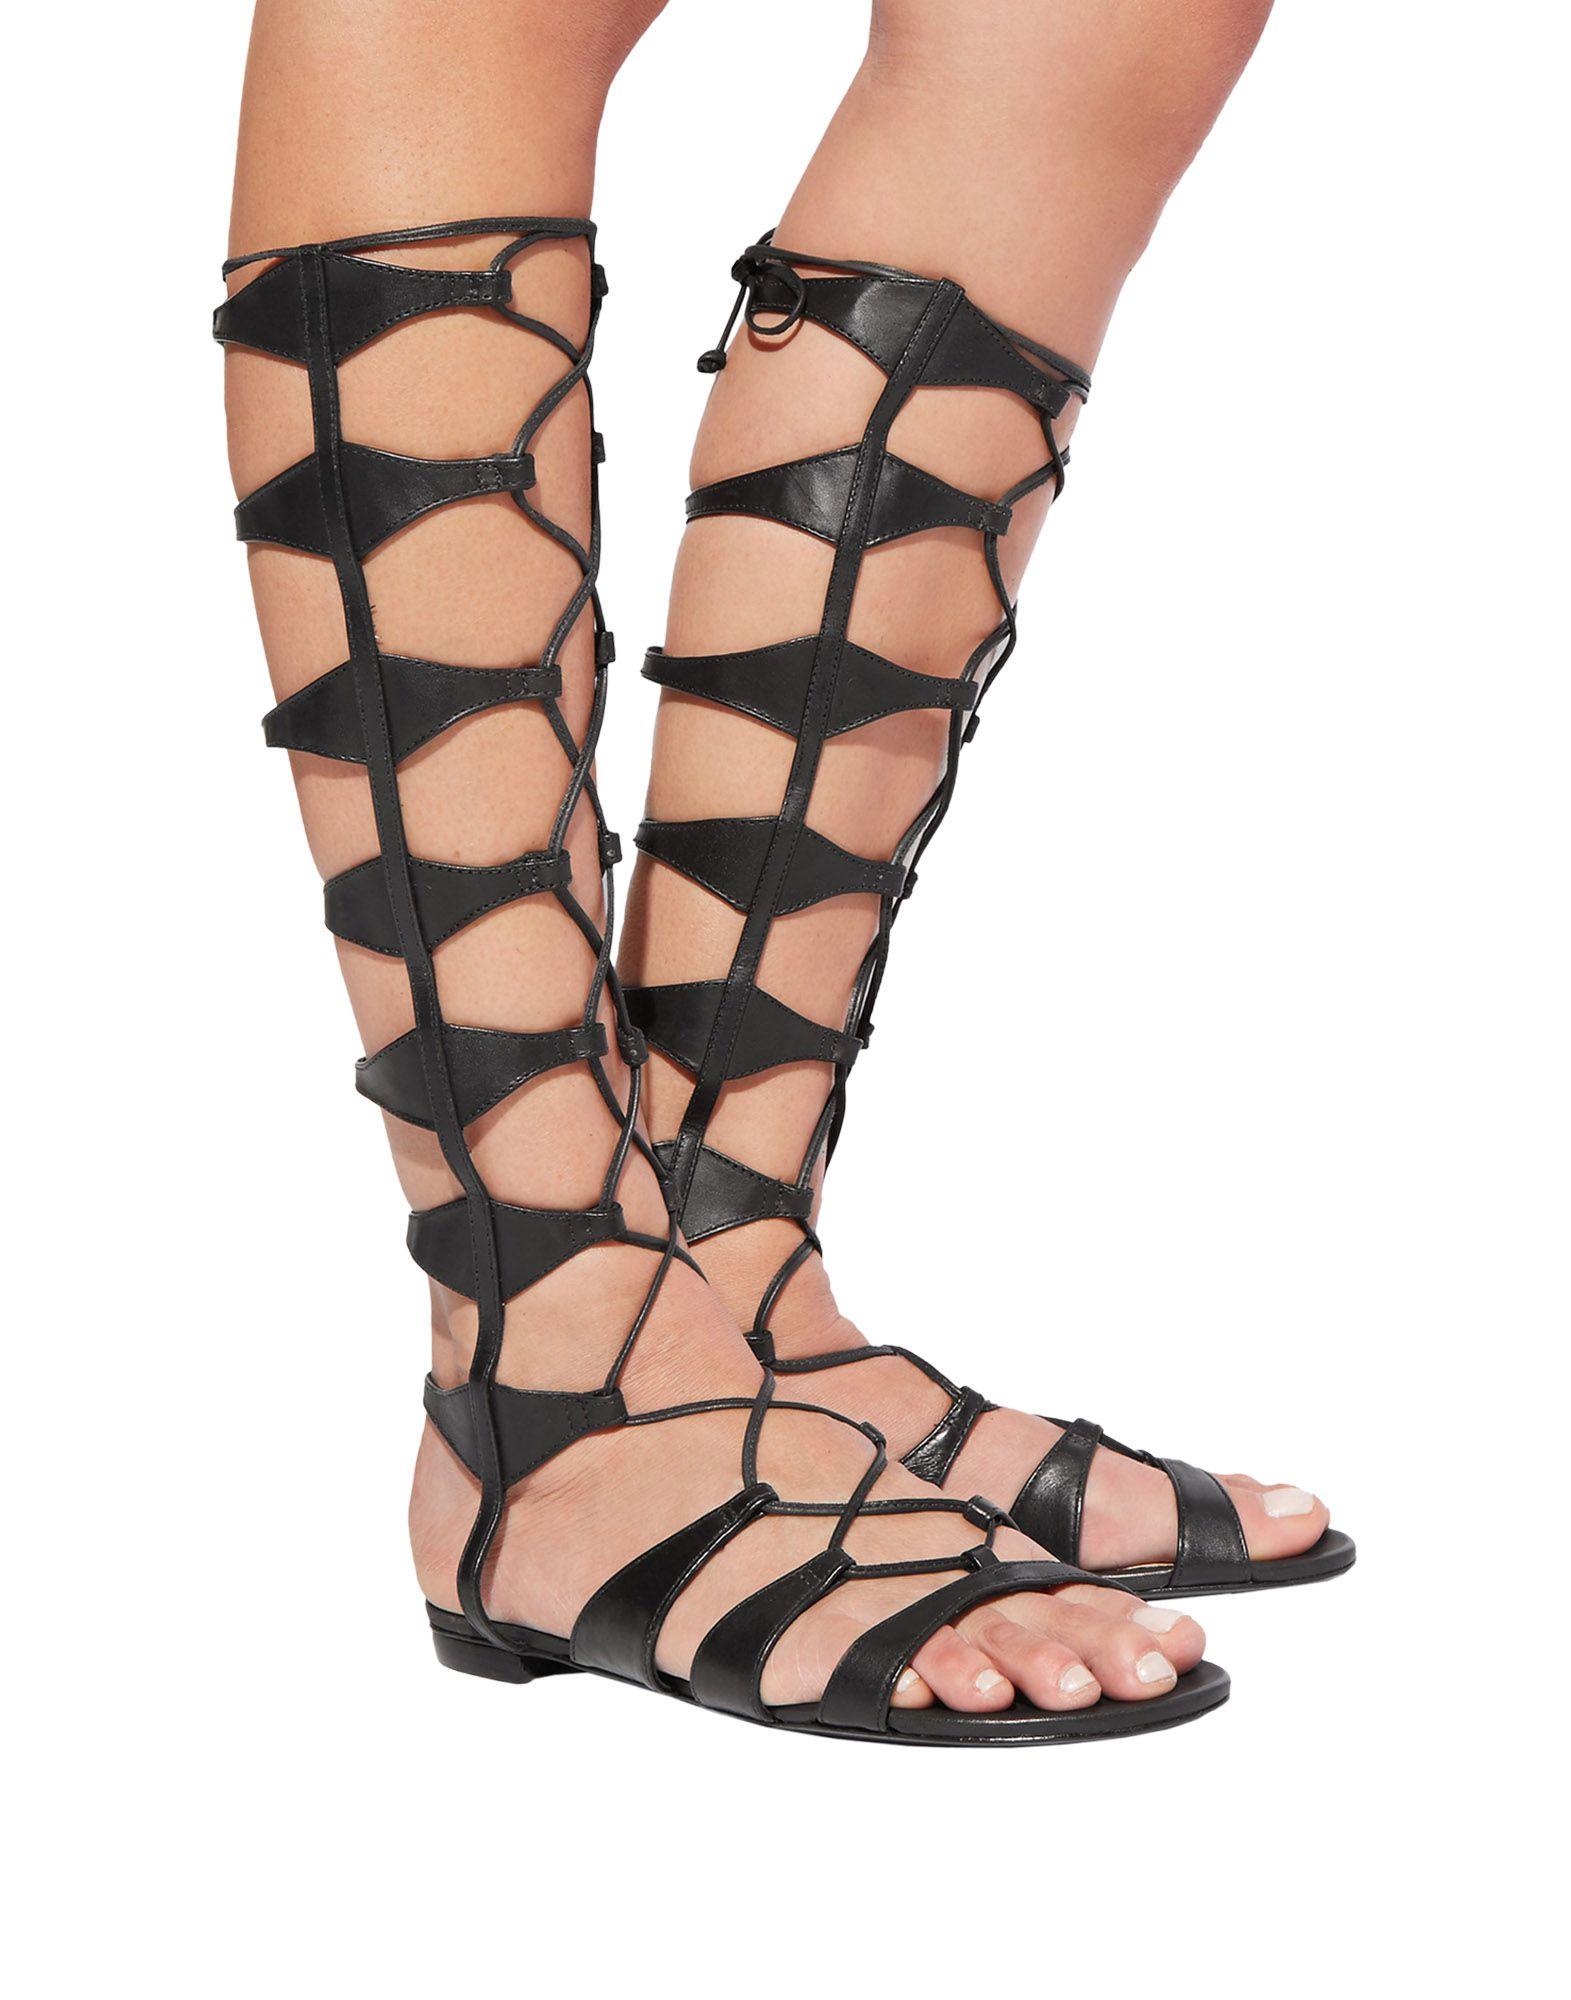 Schutz Sandalen  Damen  Sandalen 11128687MK Heiße Schuhe 9921e7